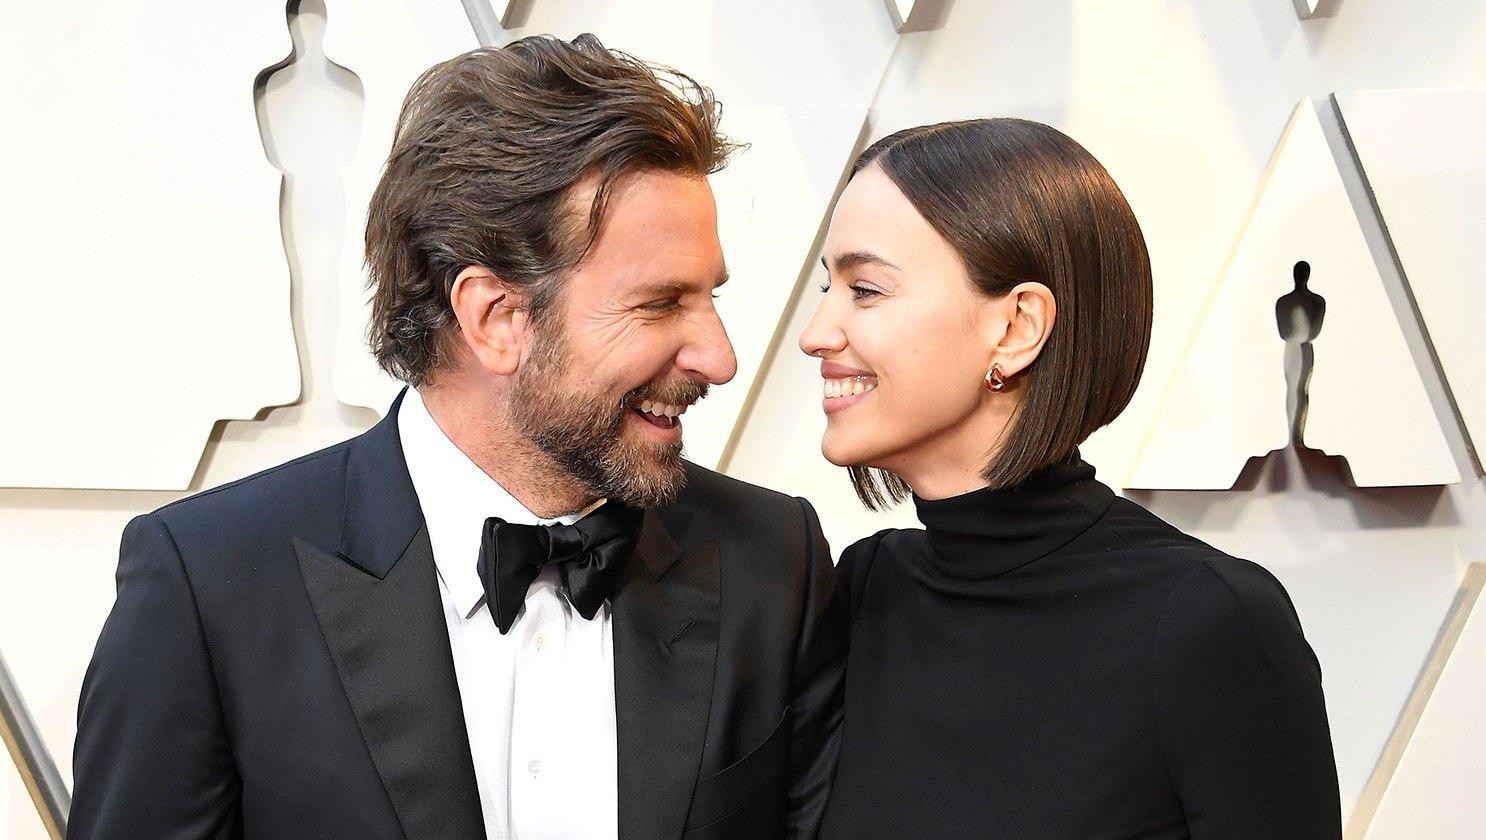 Bradley Cooper Did Not Attend the Met Gala 2019 With Irina Shayk